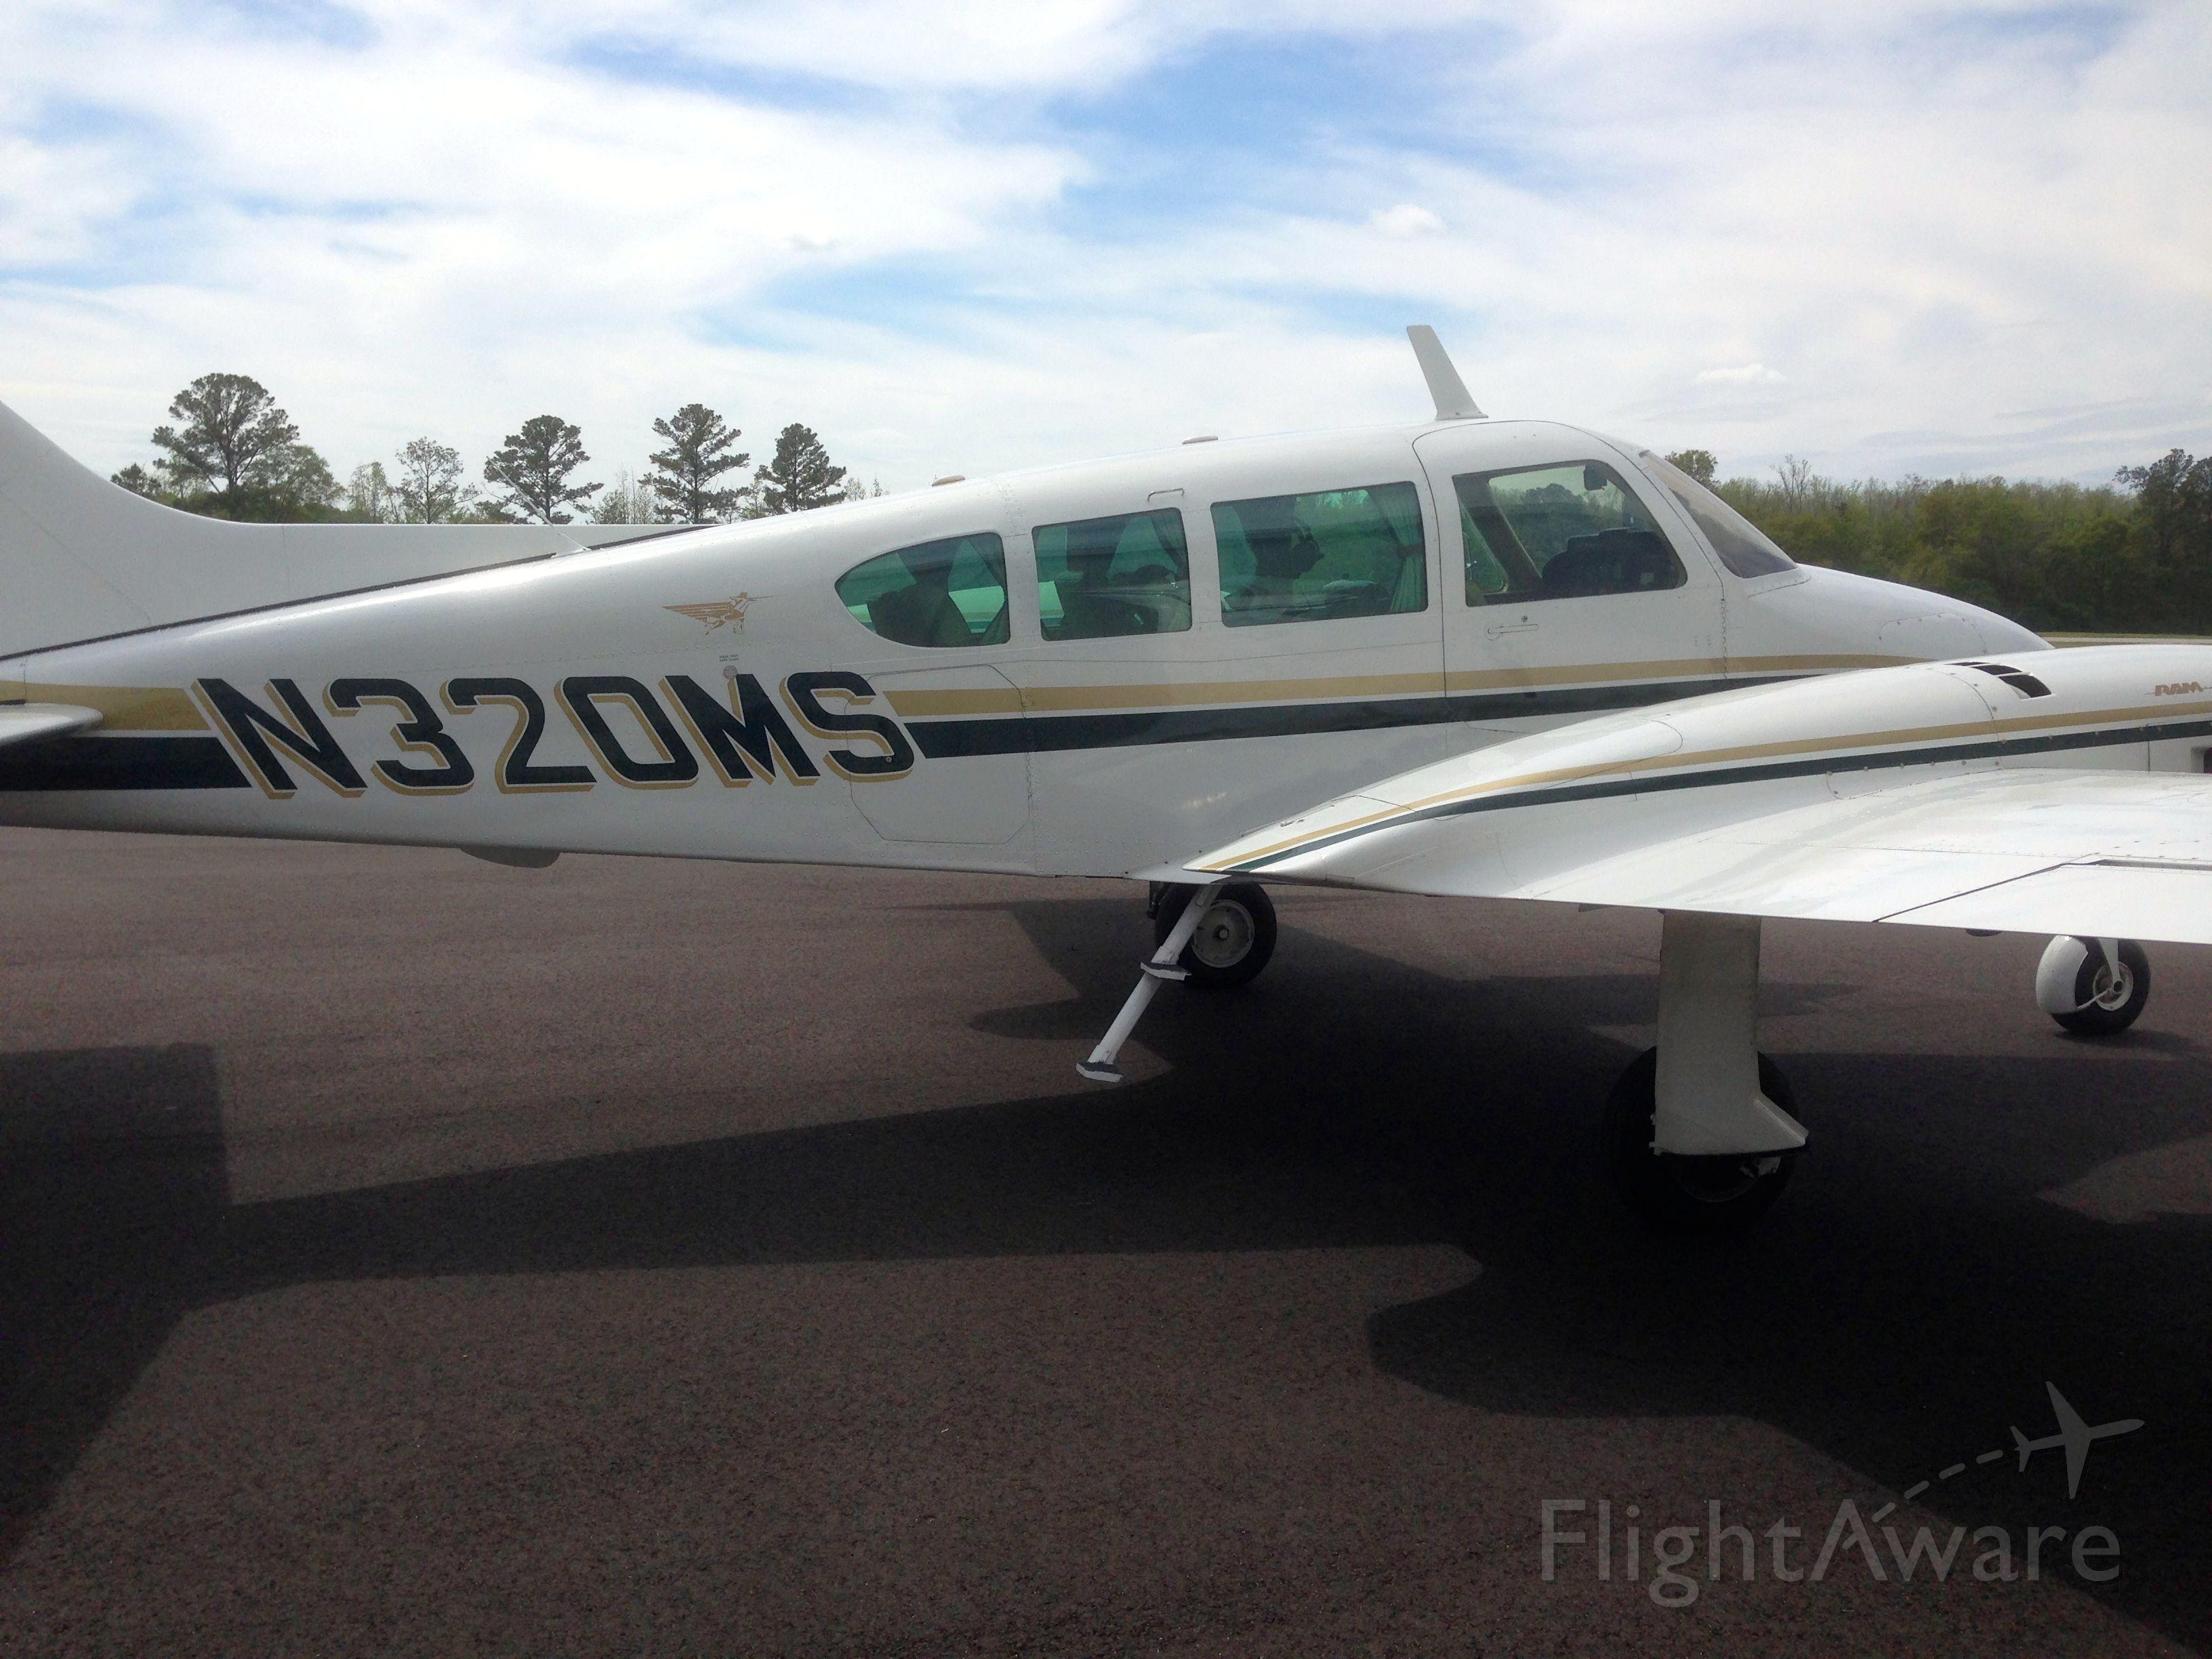 Cessna Skyhawk (N320MS)